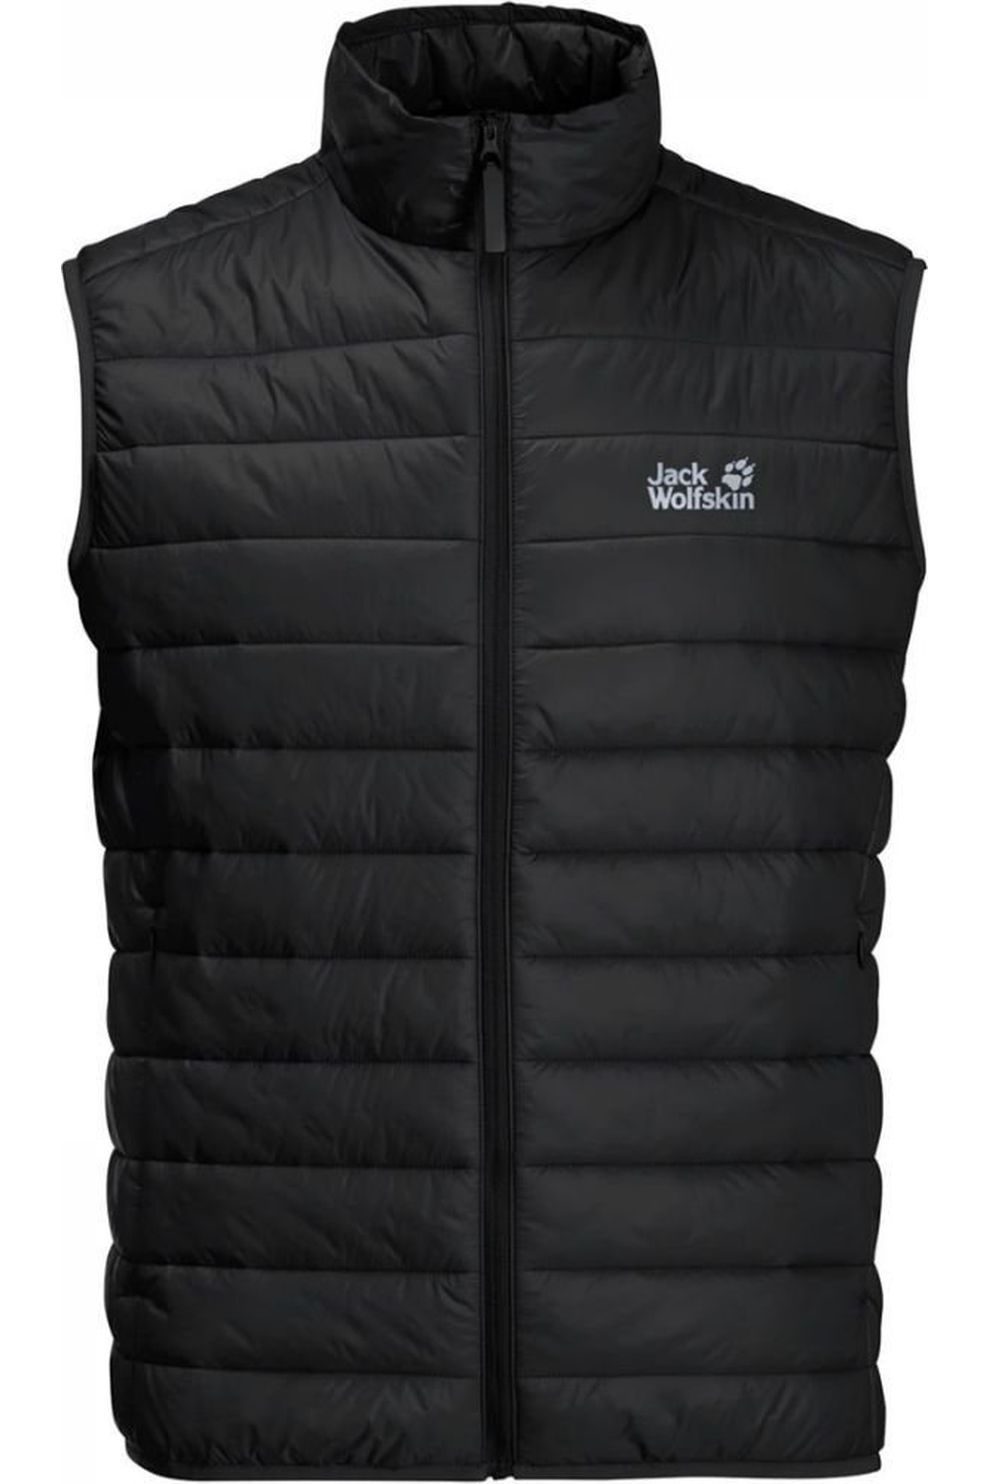 Jack Wolfskin Bodywarmer Jwp Pack And Go! voor heren Zwart Maten: M, L, XL, XXL